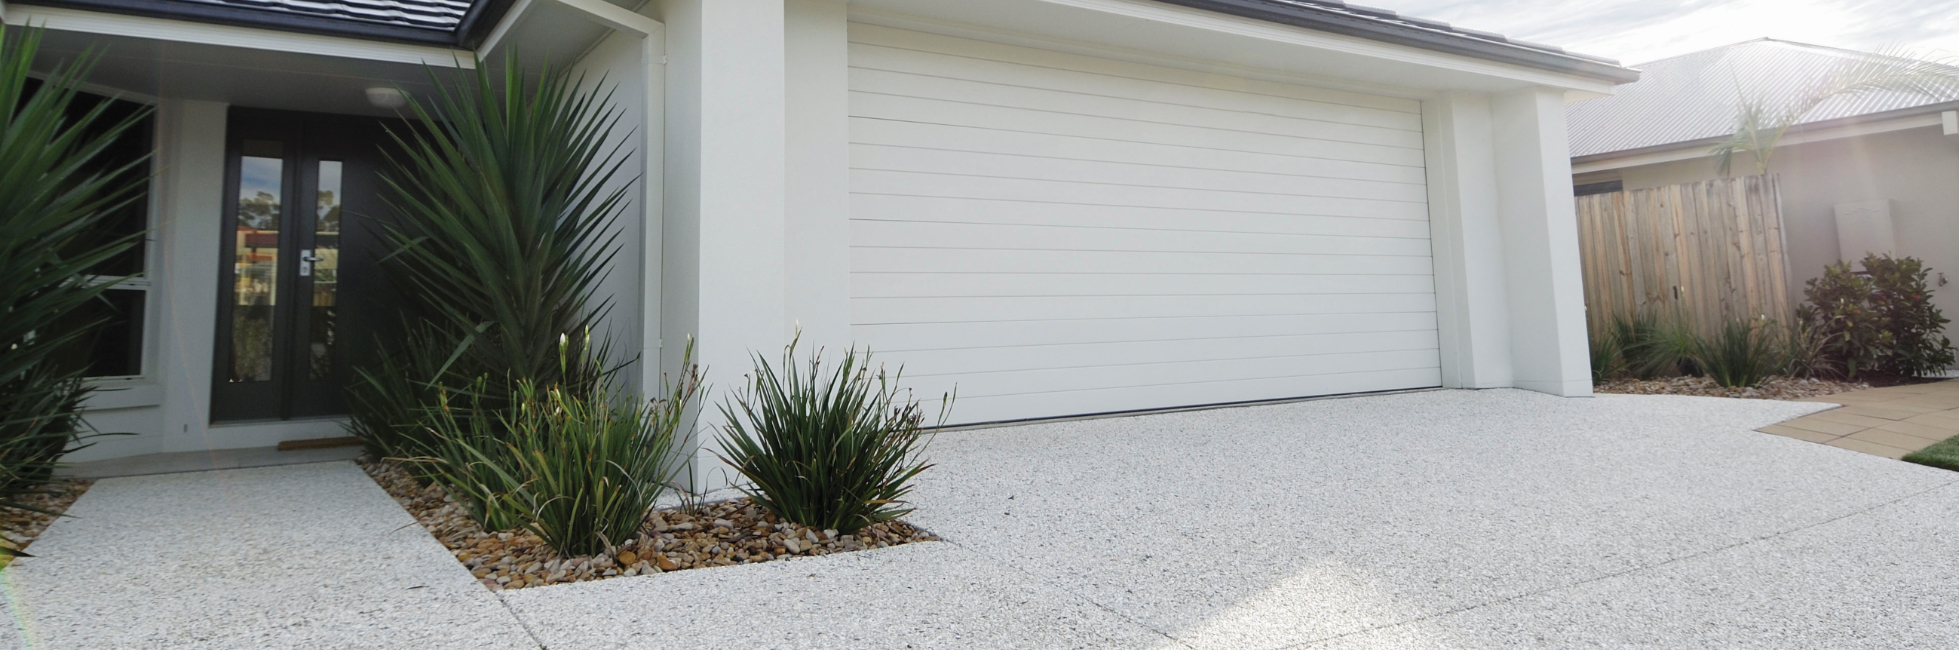 Hydro garage doors digi automation